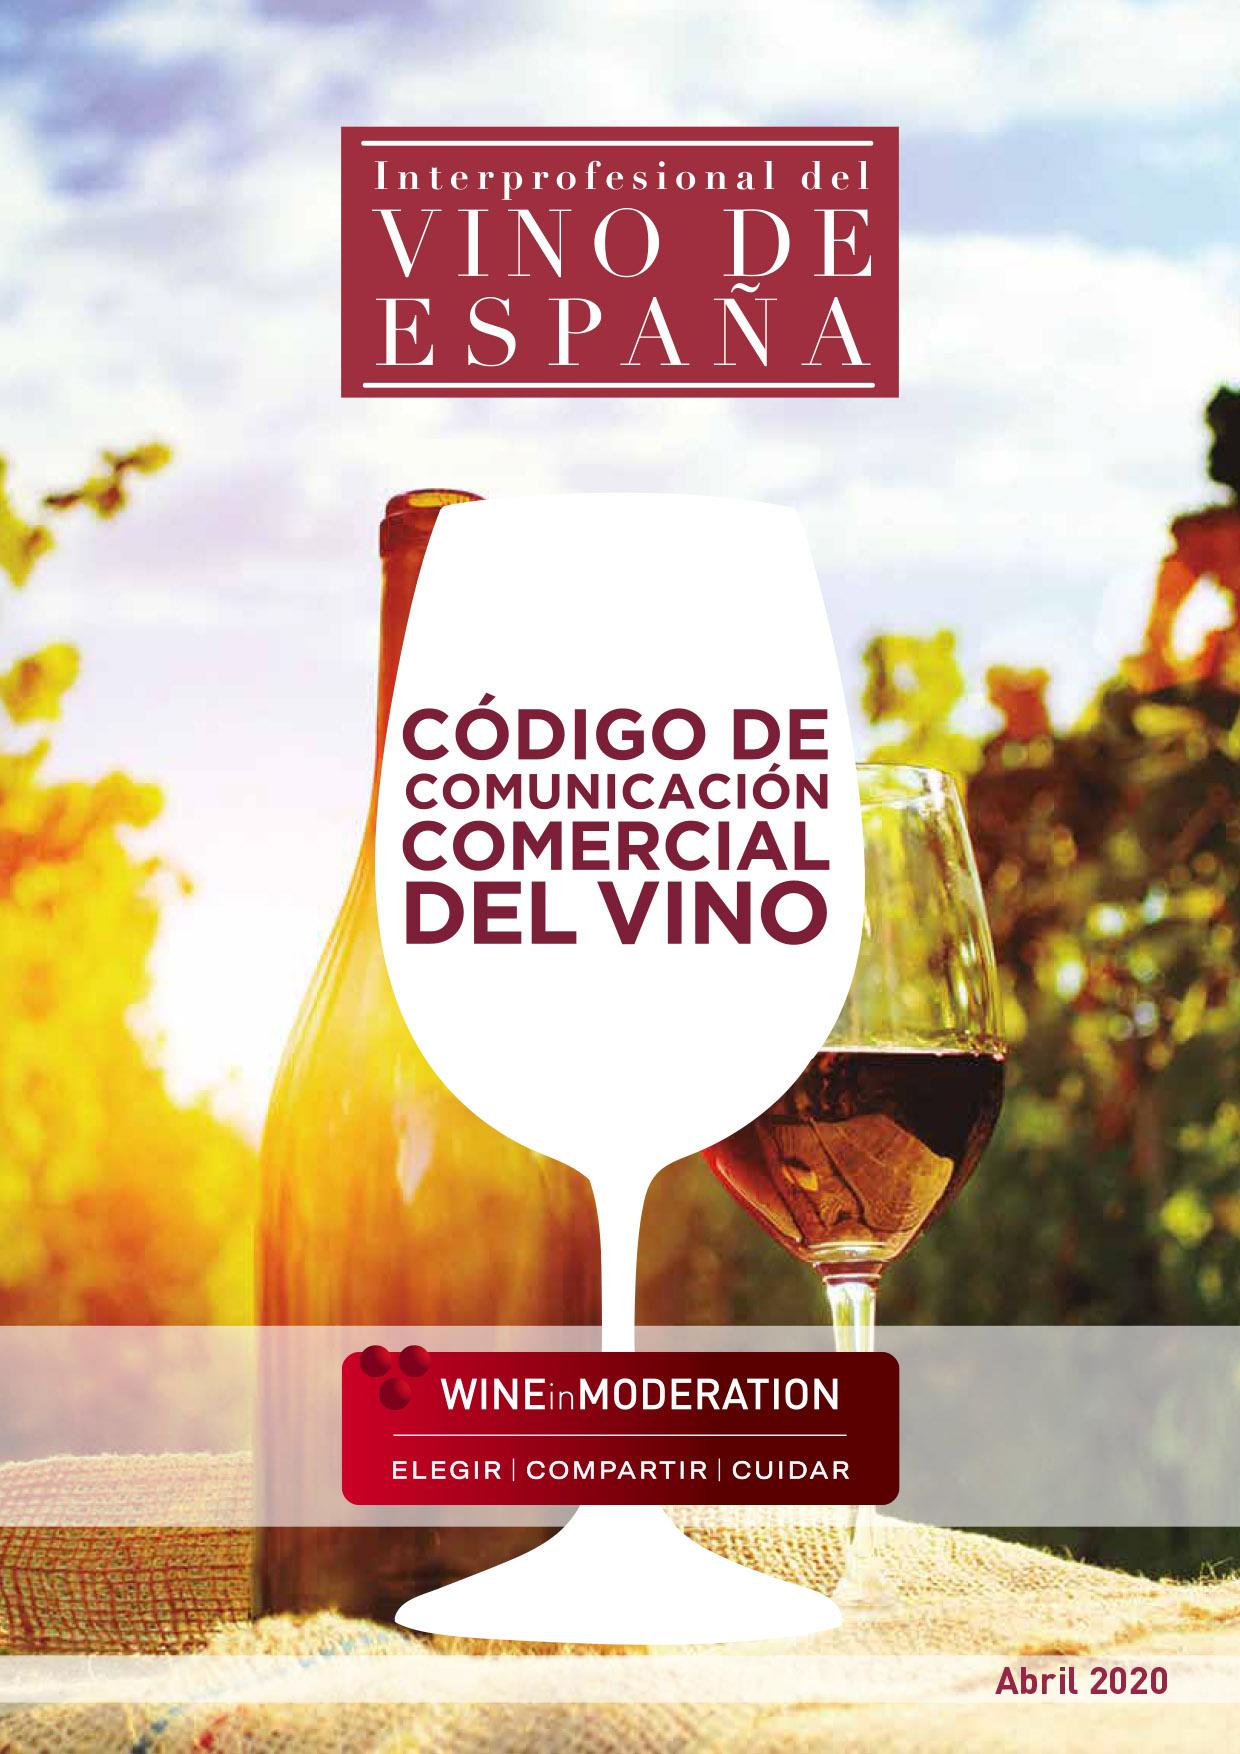 Wine in Moderation, nuevo logotipo desde abril 2020